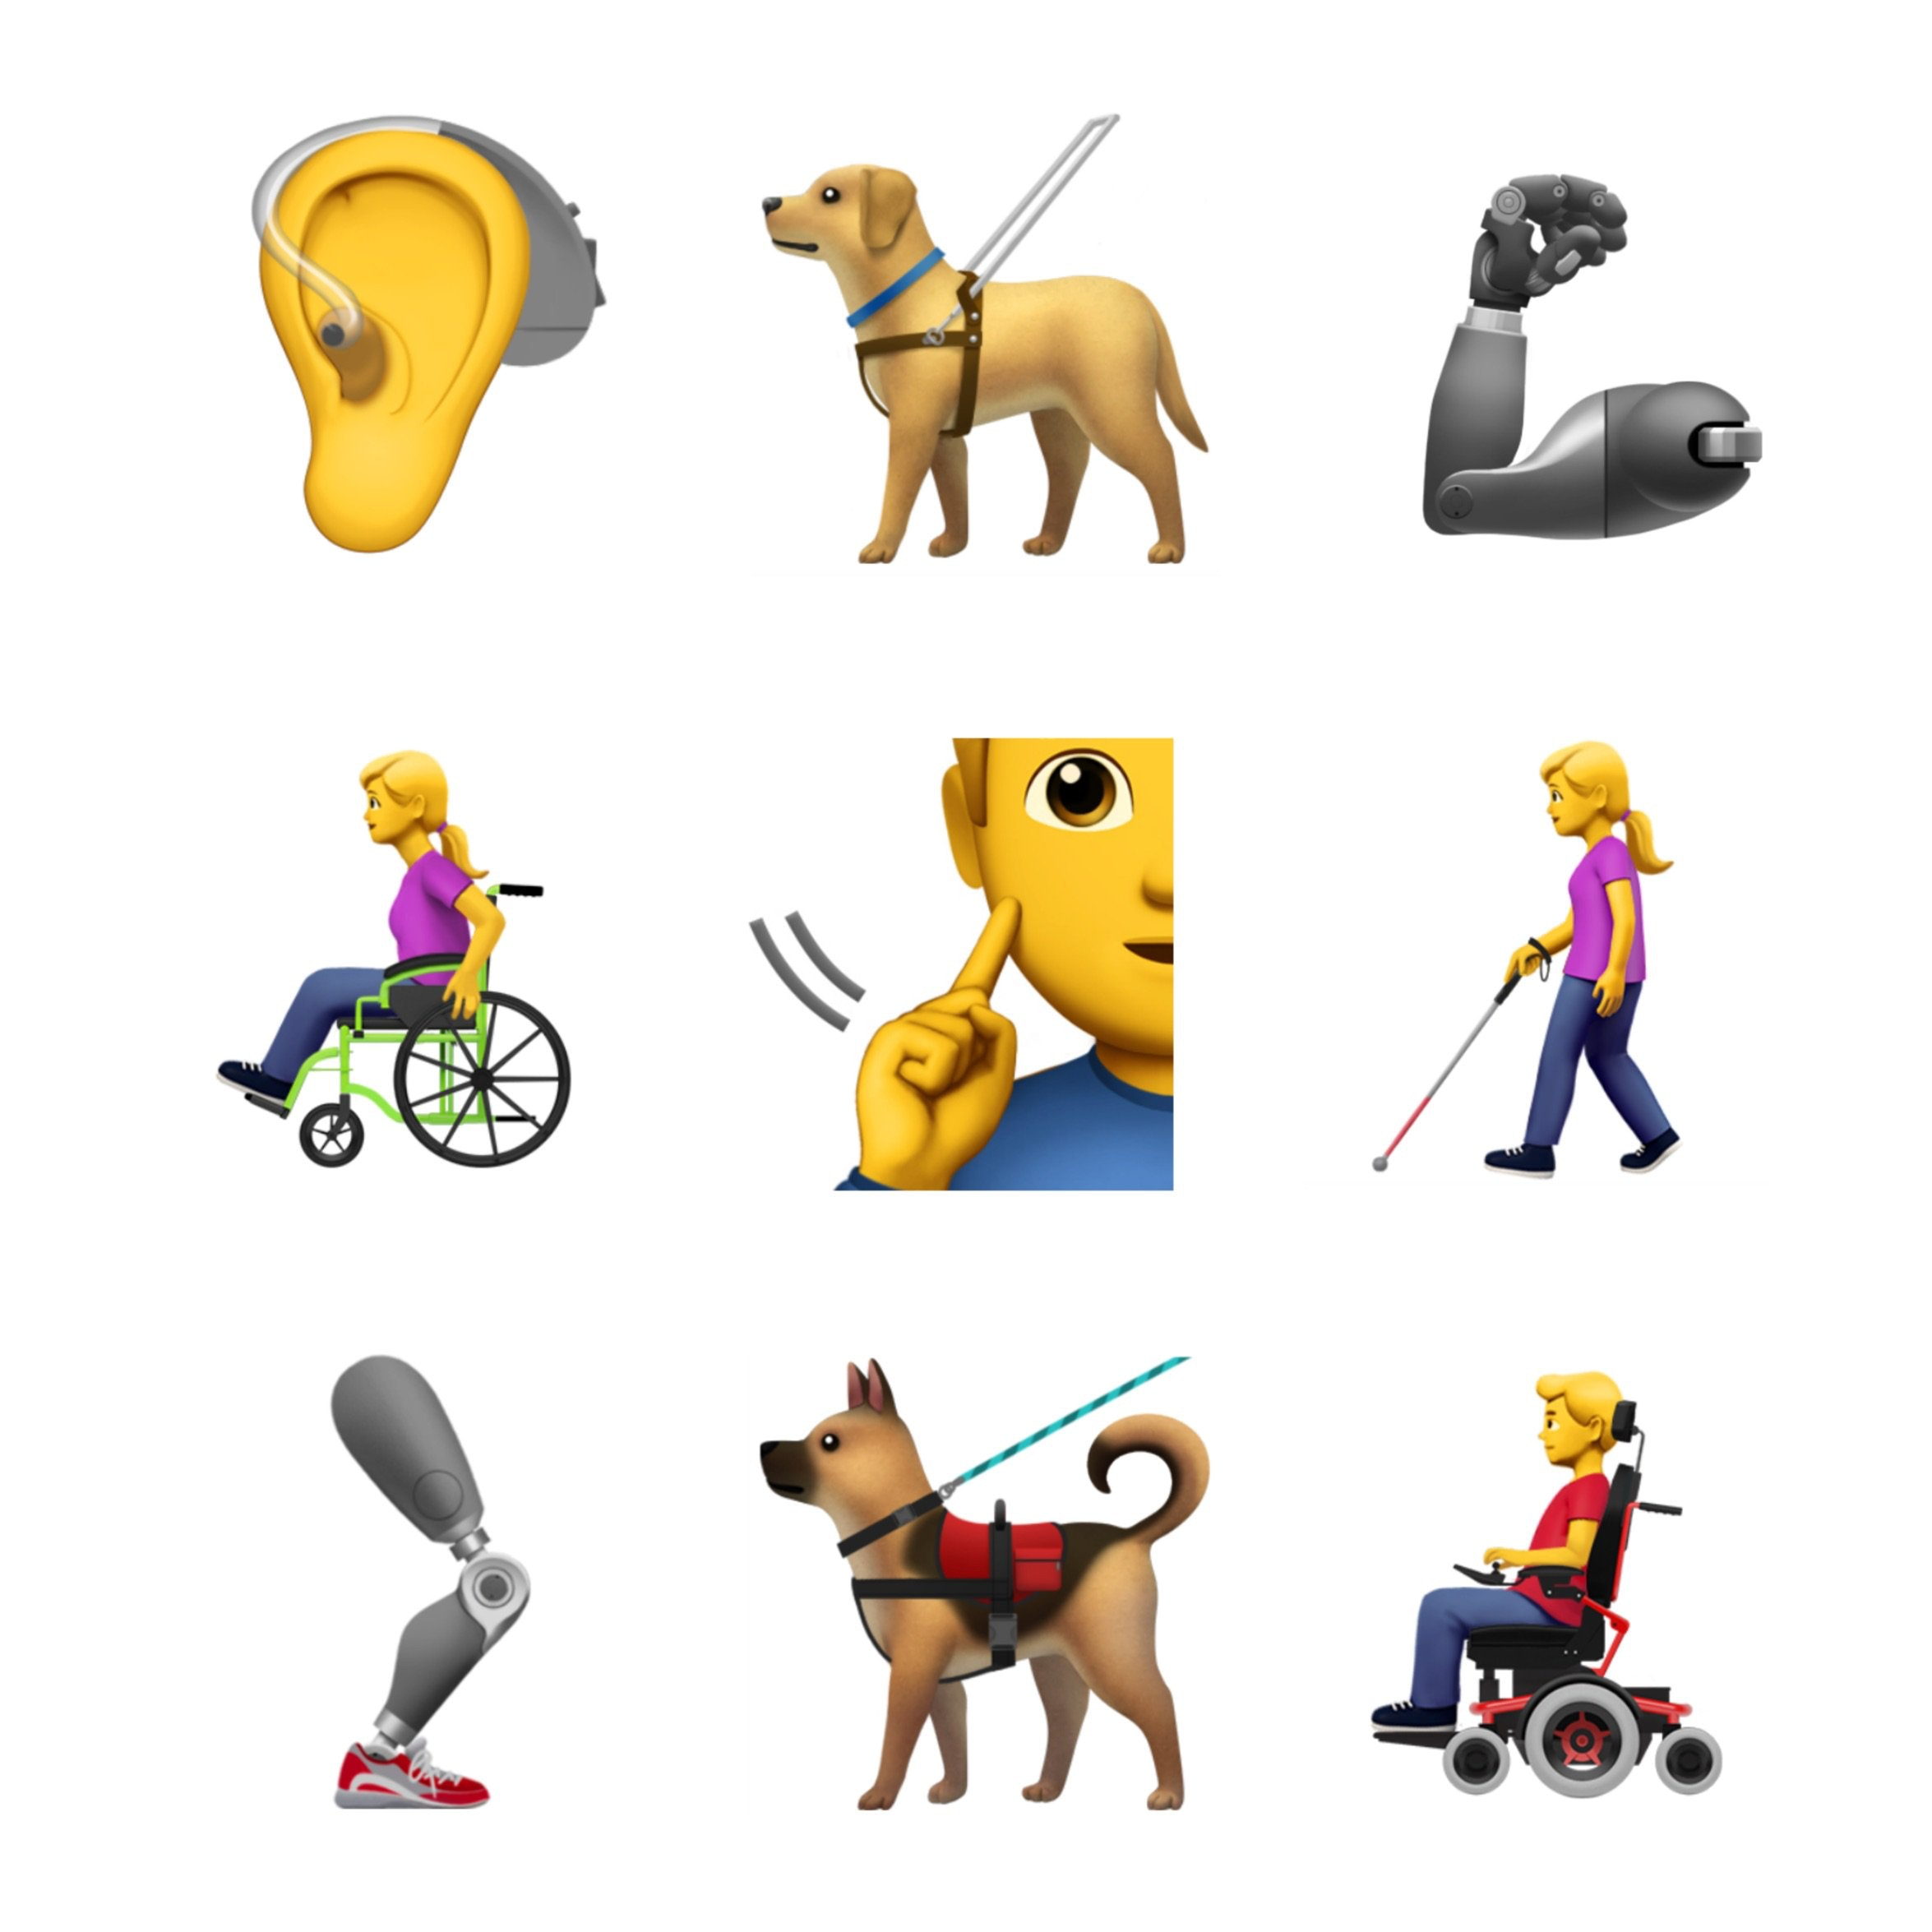 apple-accessible-emoji-proposed-2018-emojipedia